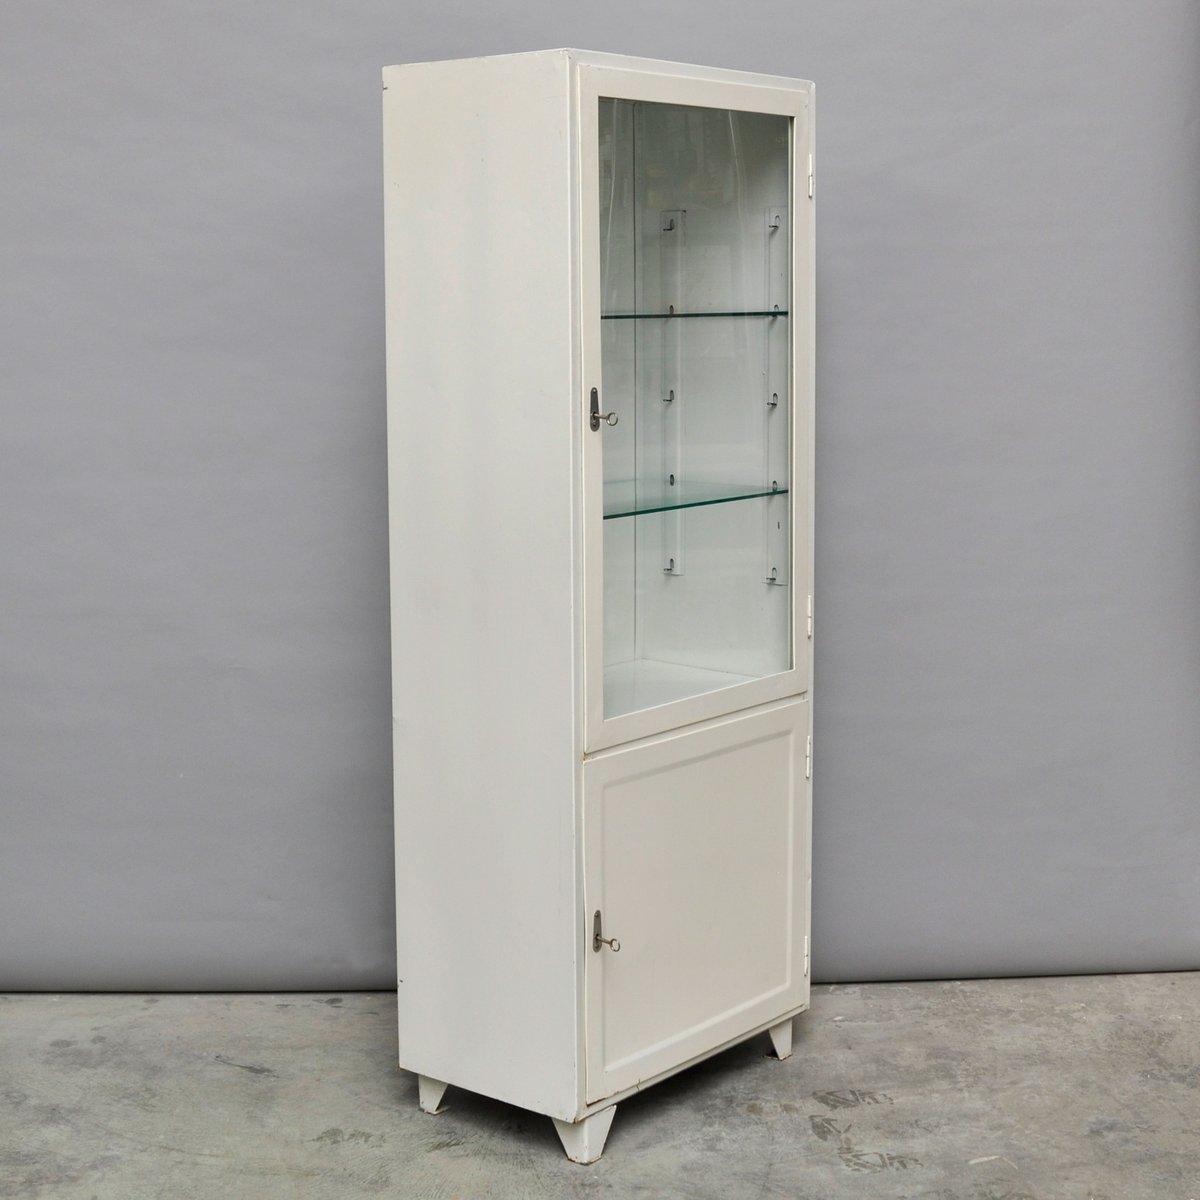 Polish Vintage Steel and Glass Medicine Cabinet, 1970s for sale at ...